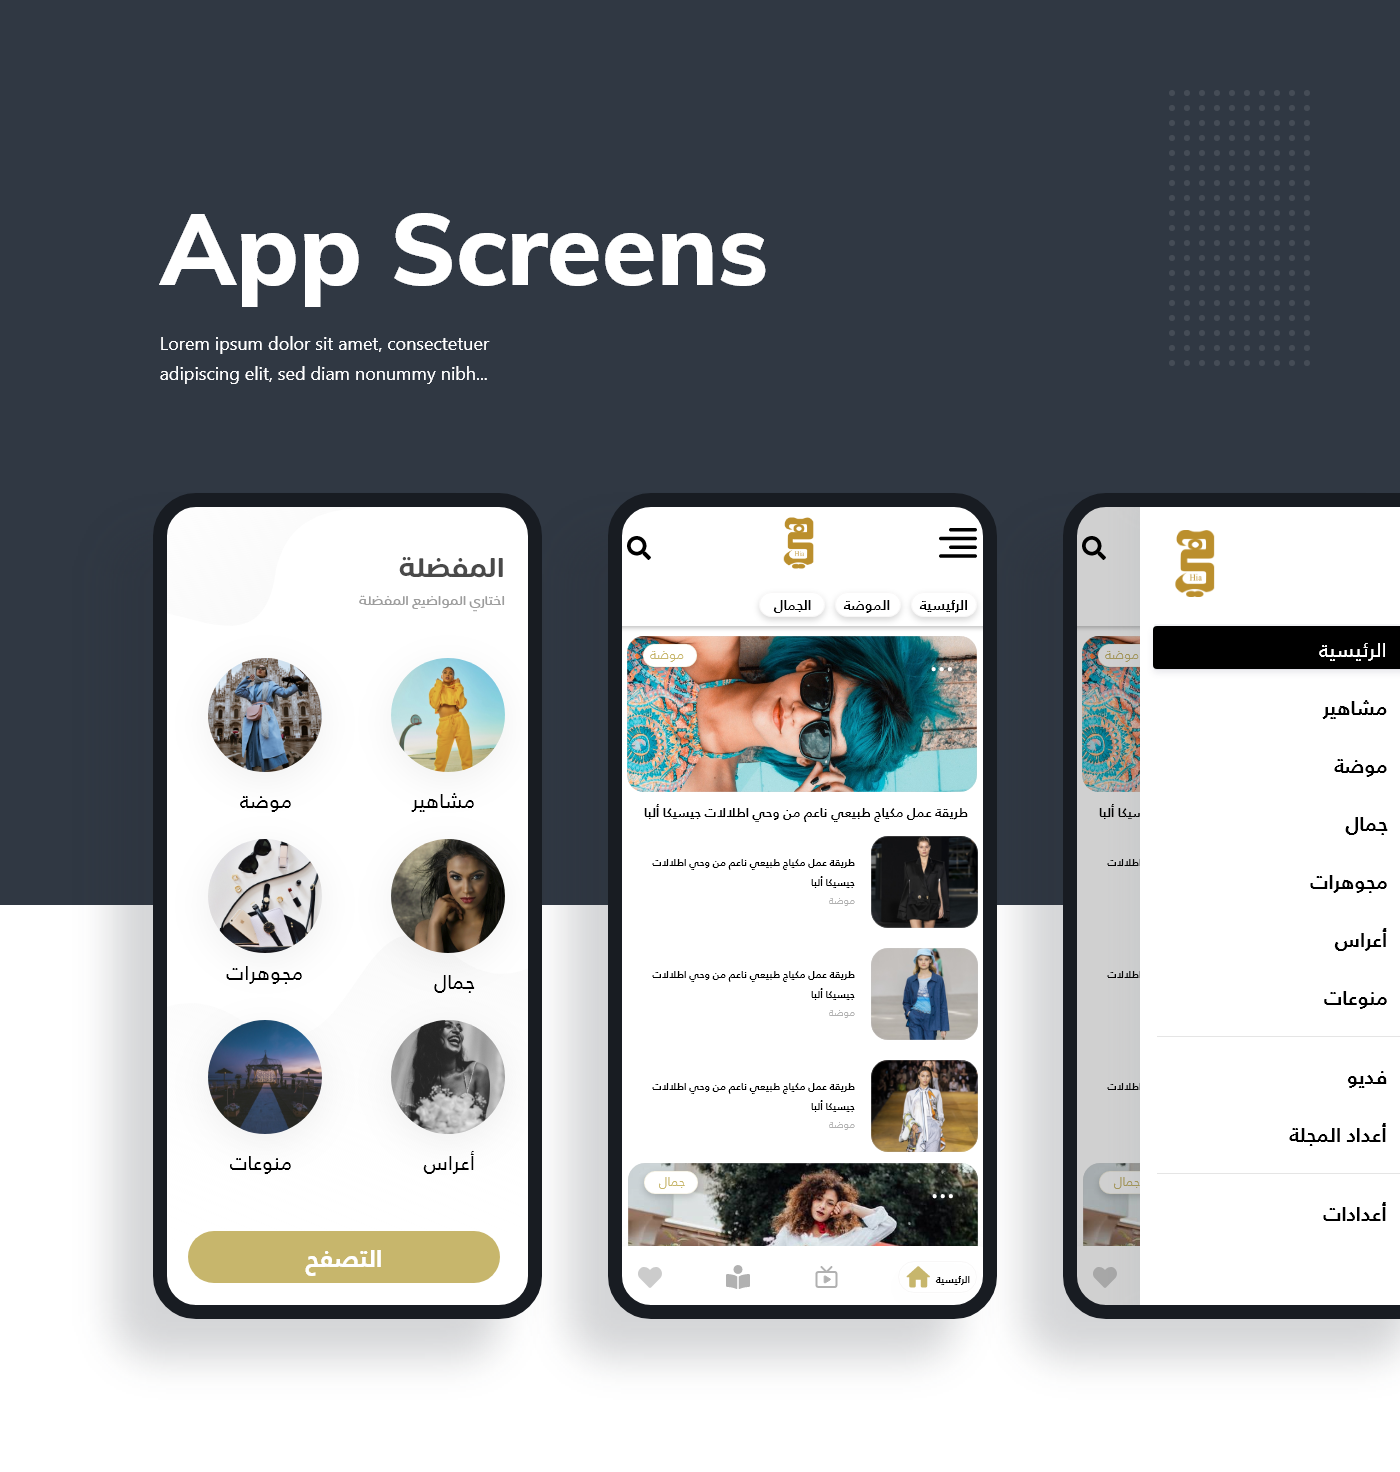 app application Interface iphone Mobile app UI ui design UI/UX user experience ux